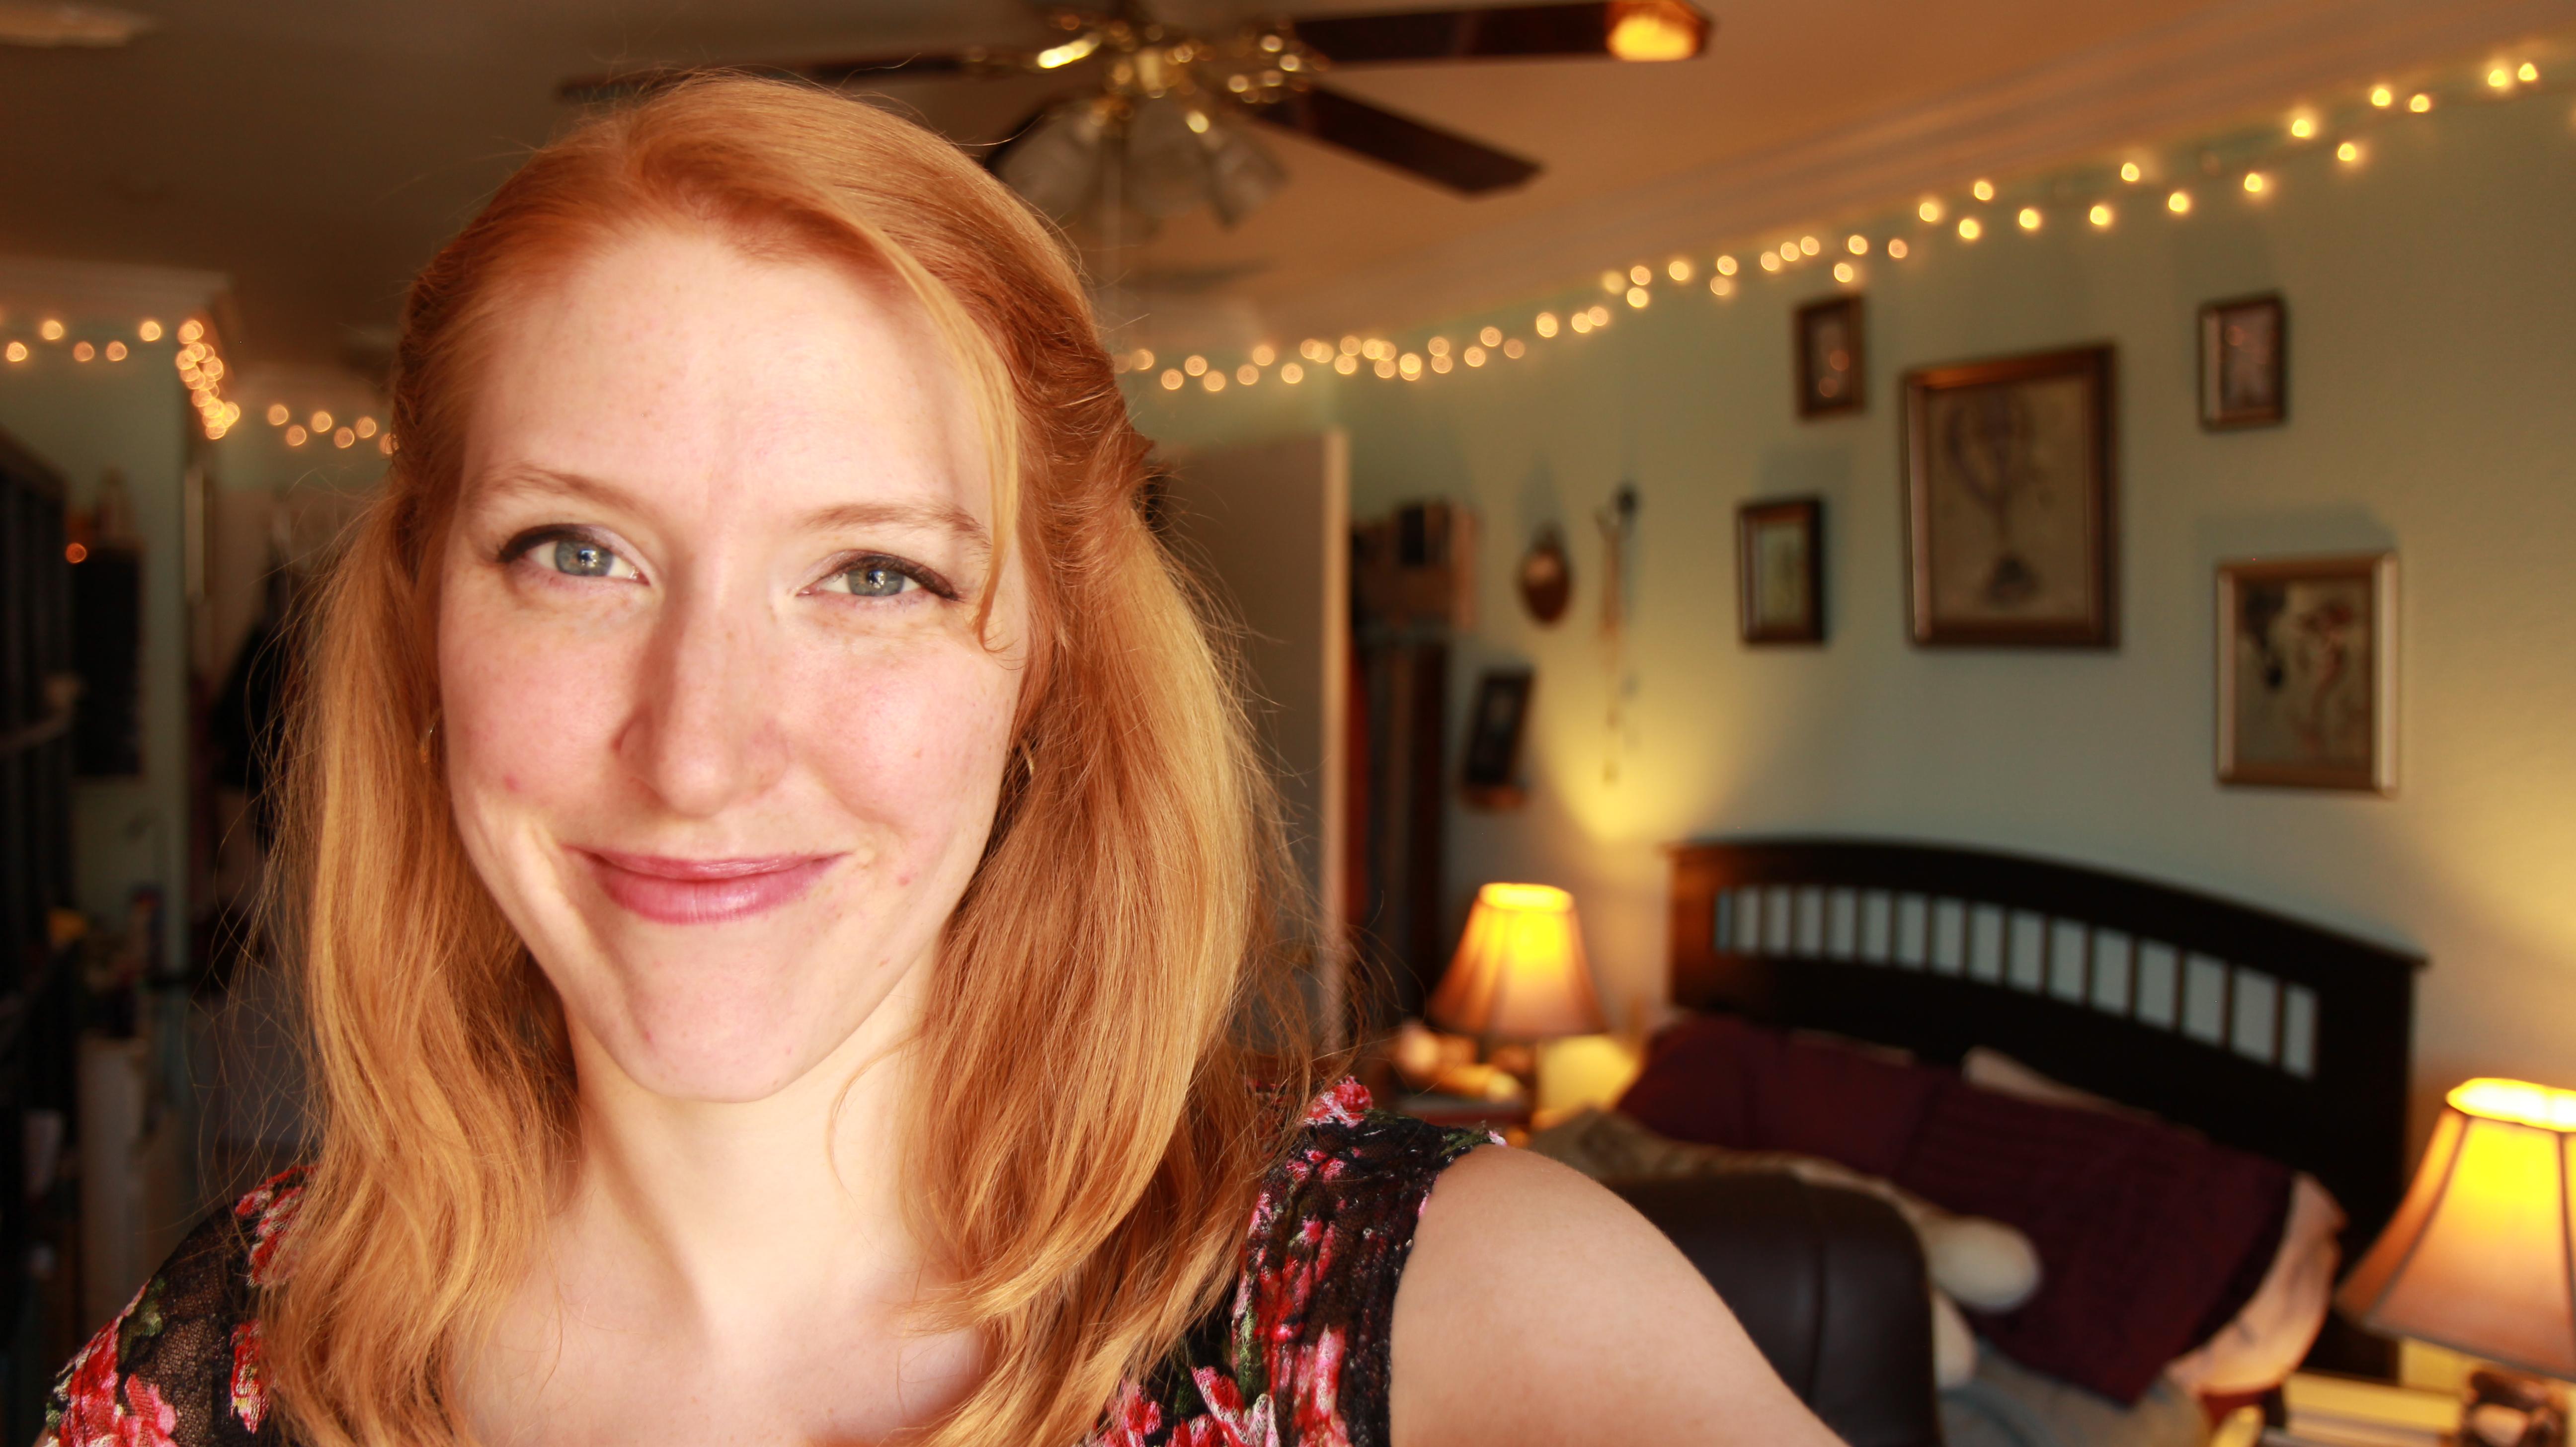 Screenwriter portrait